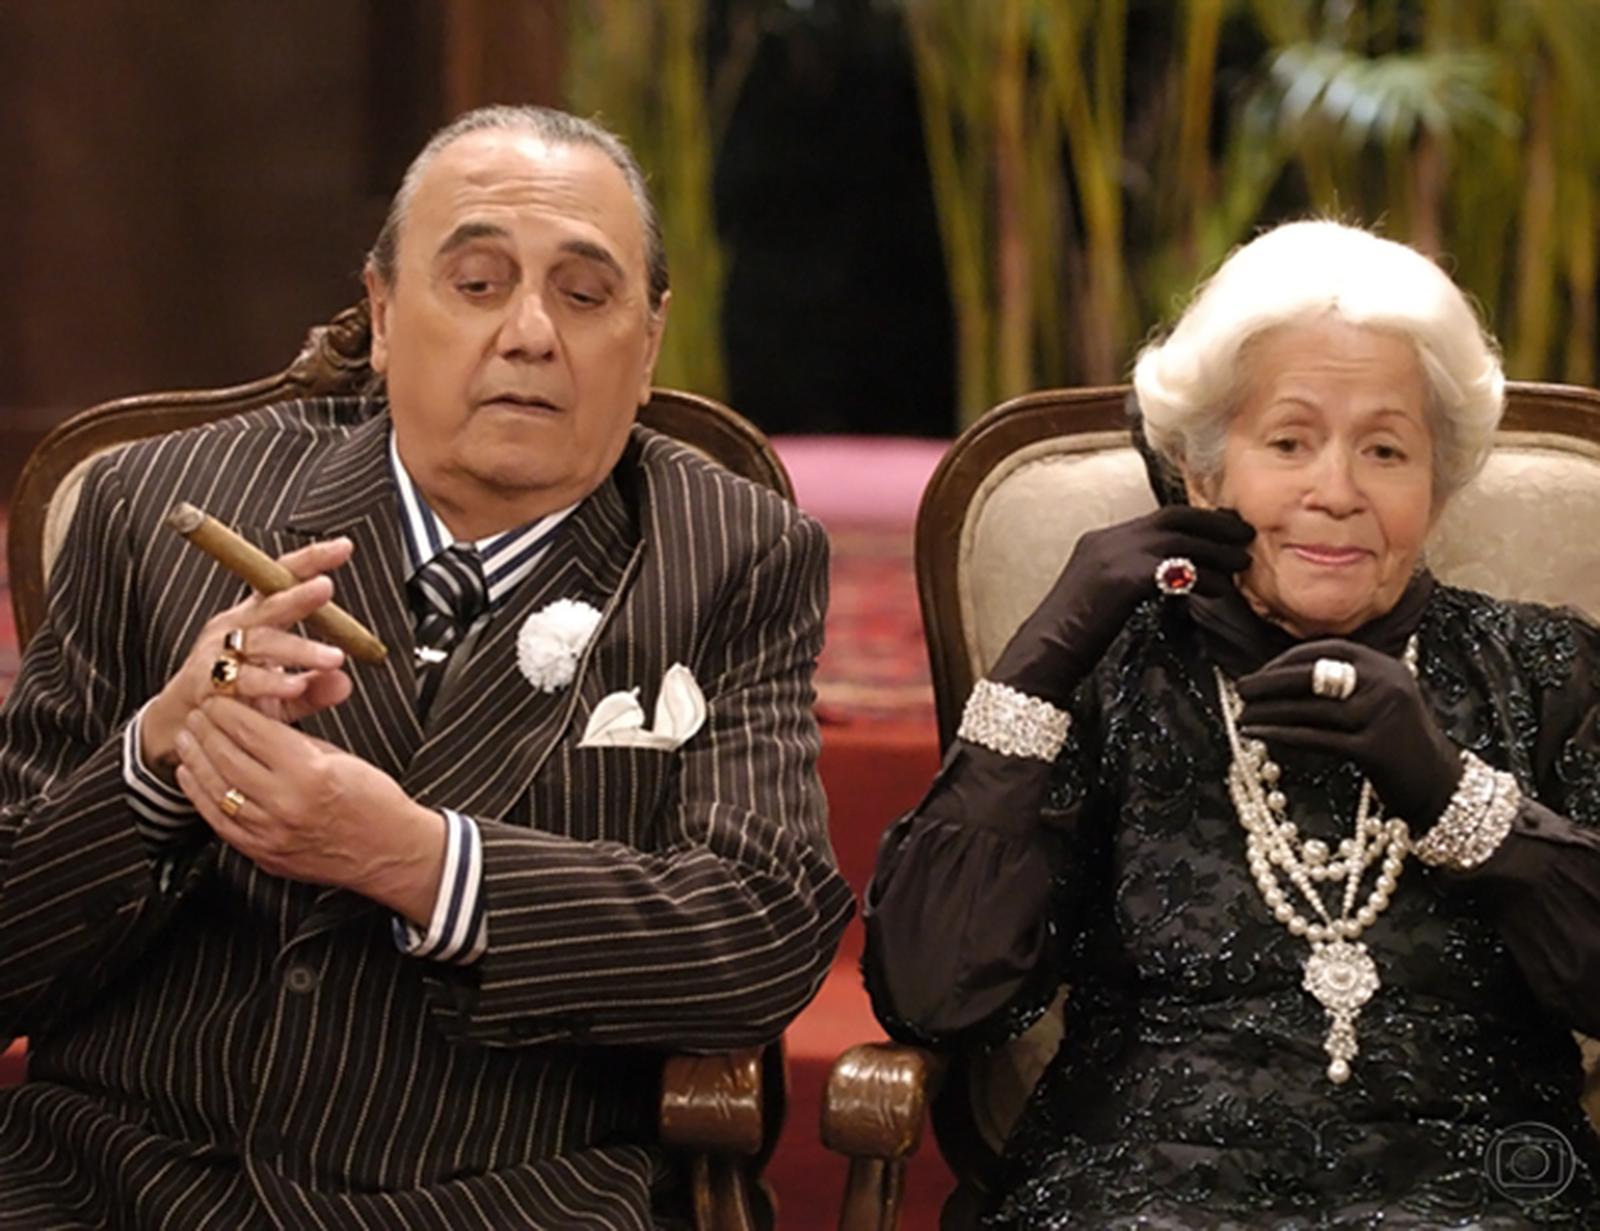 Morre aos 86 anos o comediante Agildo Ribeiro